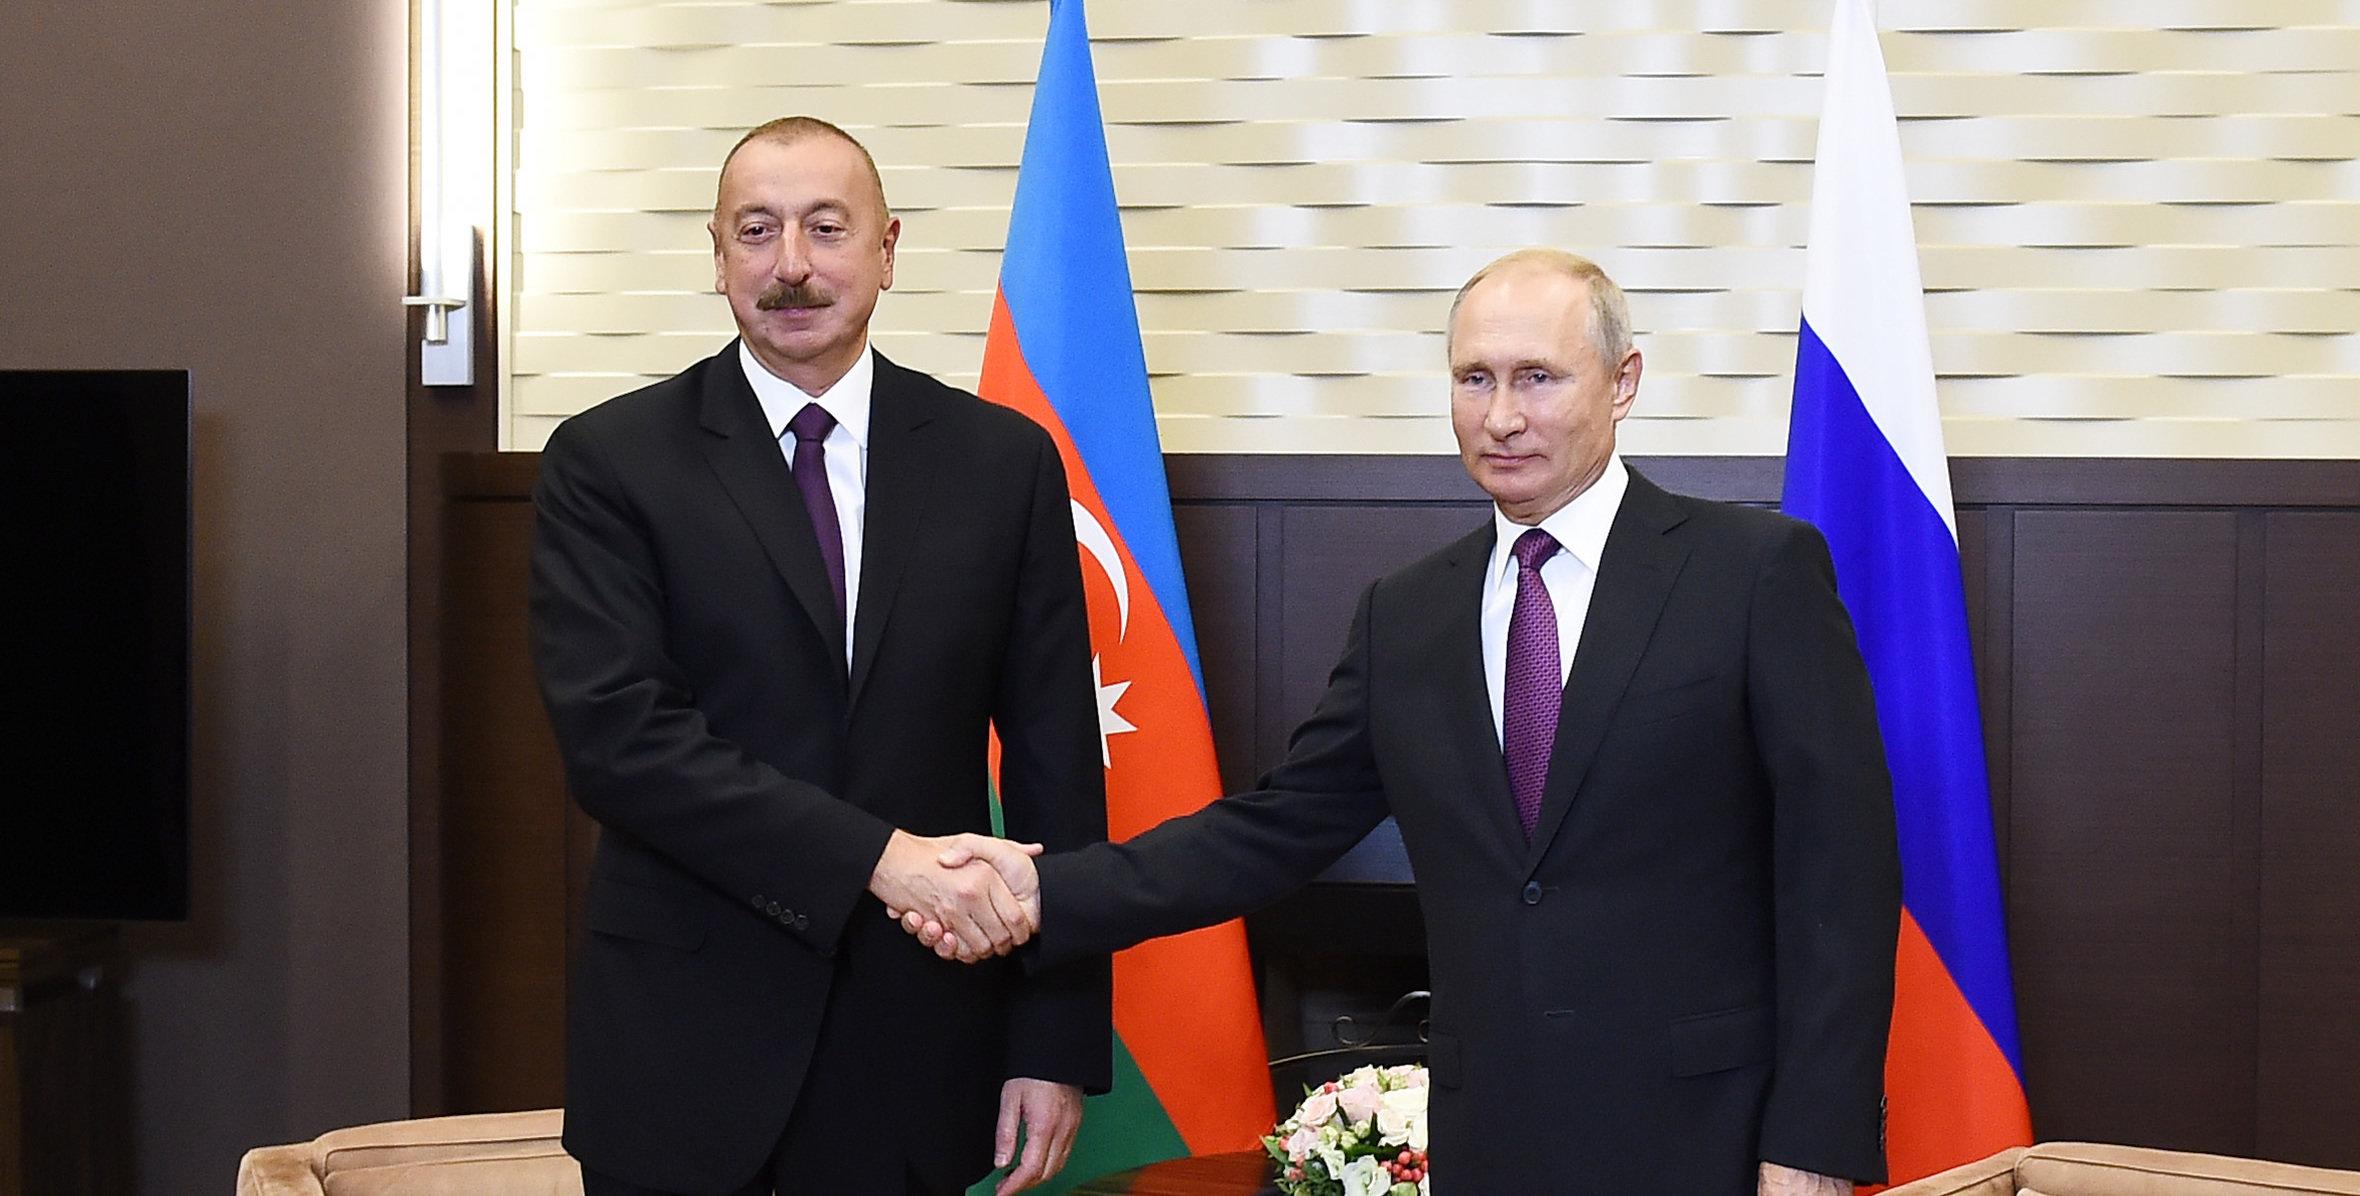 Aliyev_putin.jpg (707 KB)